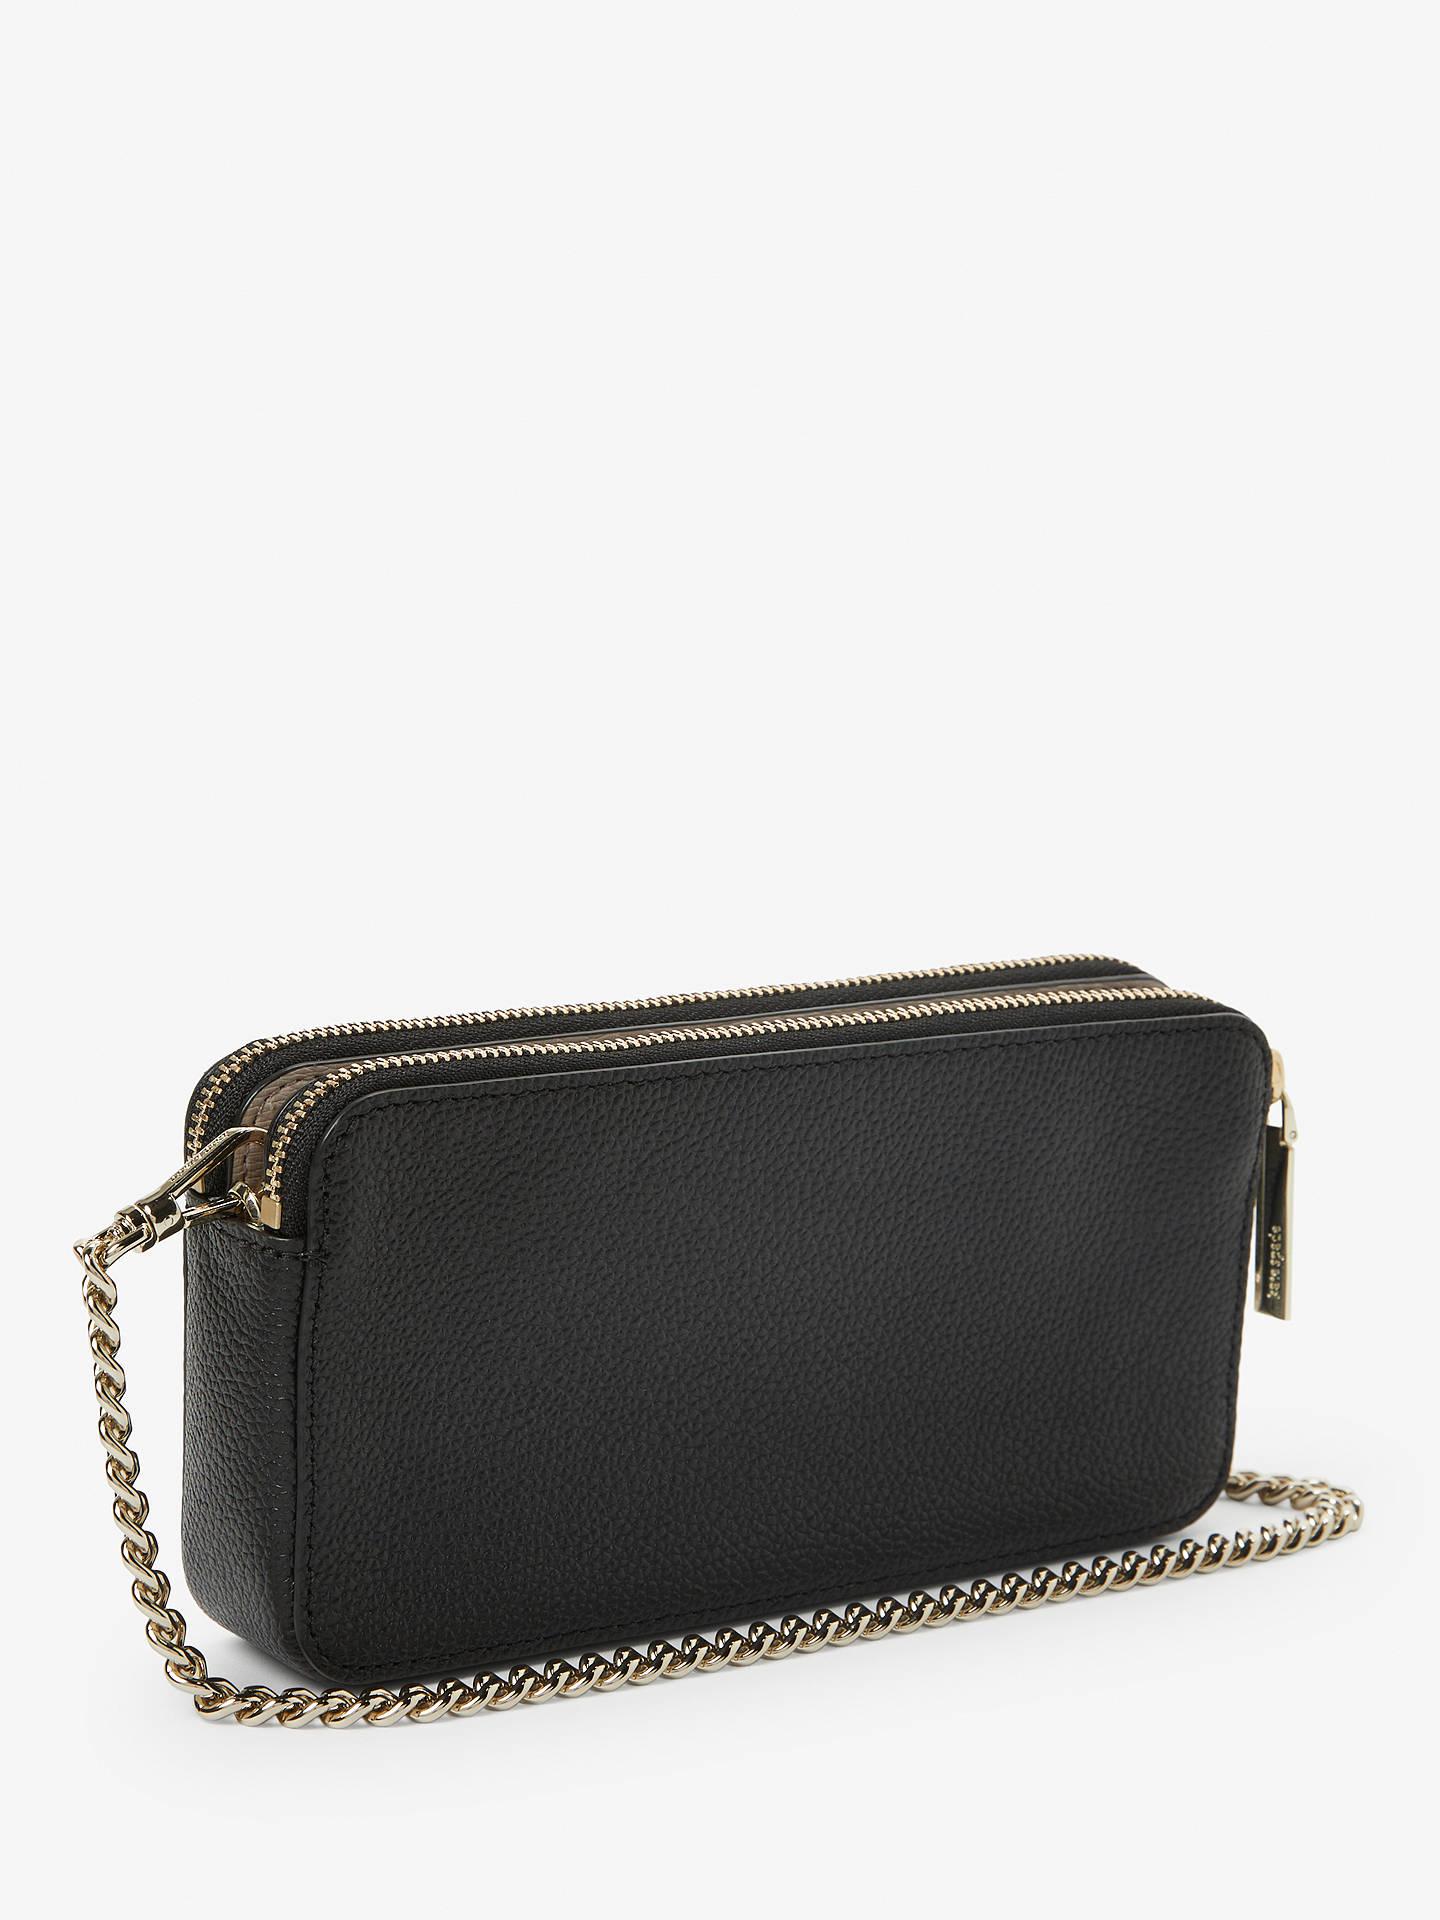 dd794c5f3 Buy kate spade new york Margaux Leather Double Zip Mini Cross Body Bag,  Black Online ...